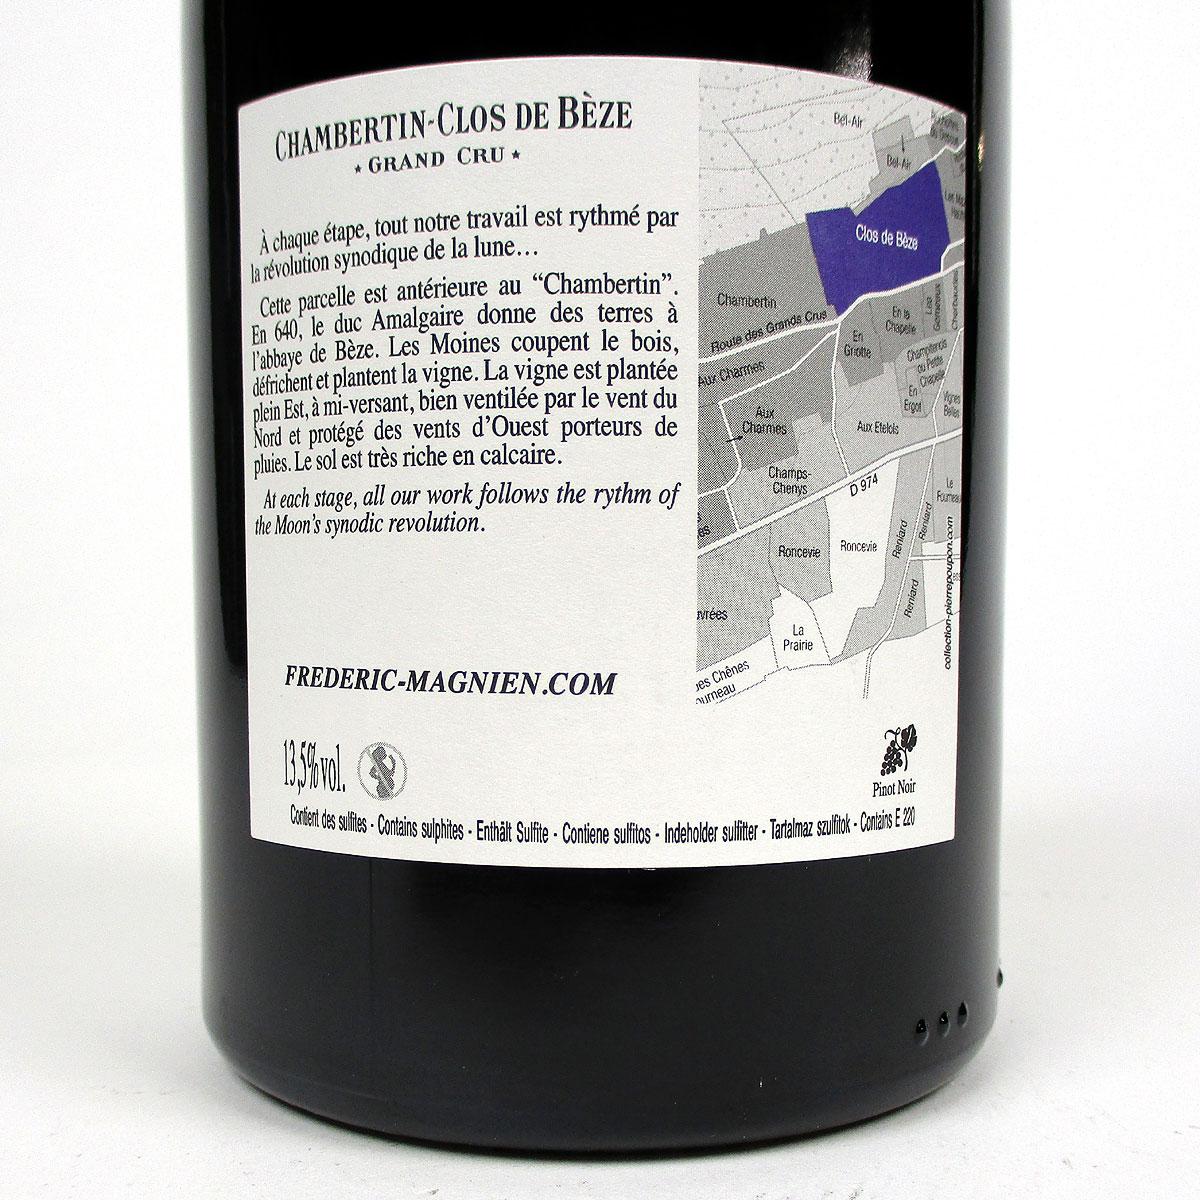 Chambertin-Clos de Bèze: Frédéric Magnien Grand Cru 2017 - Bottle Rear Label